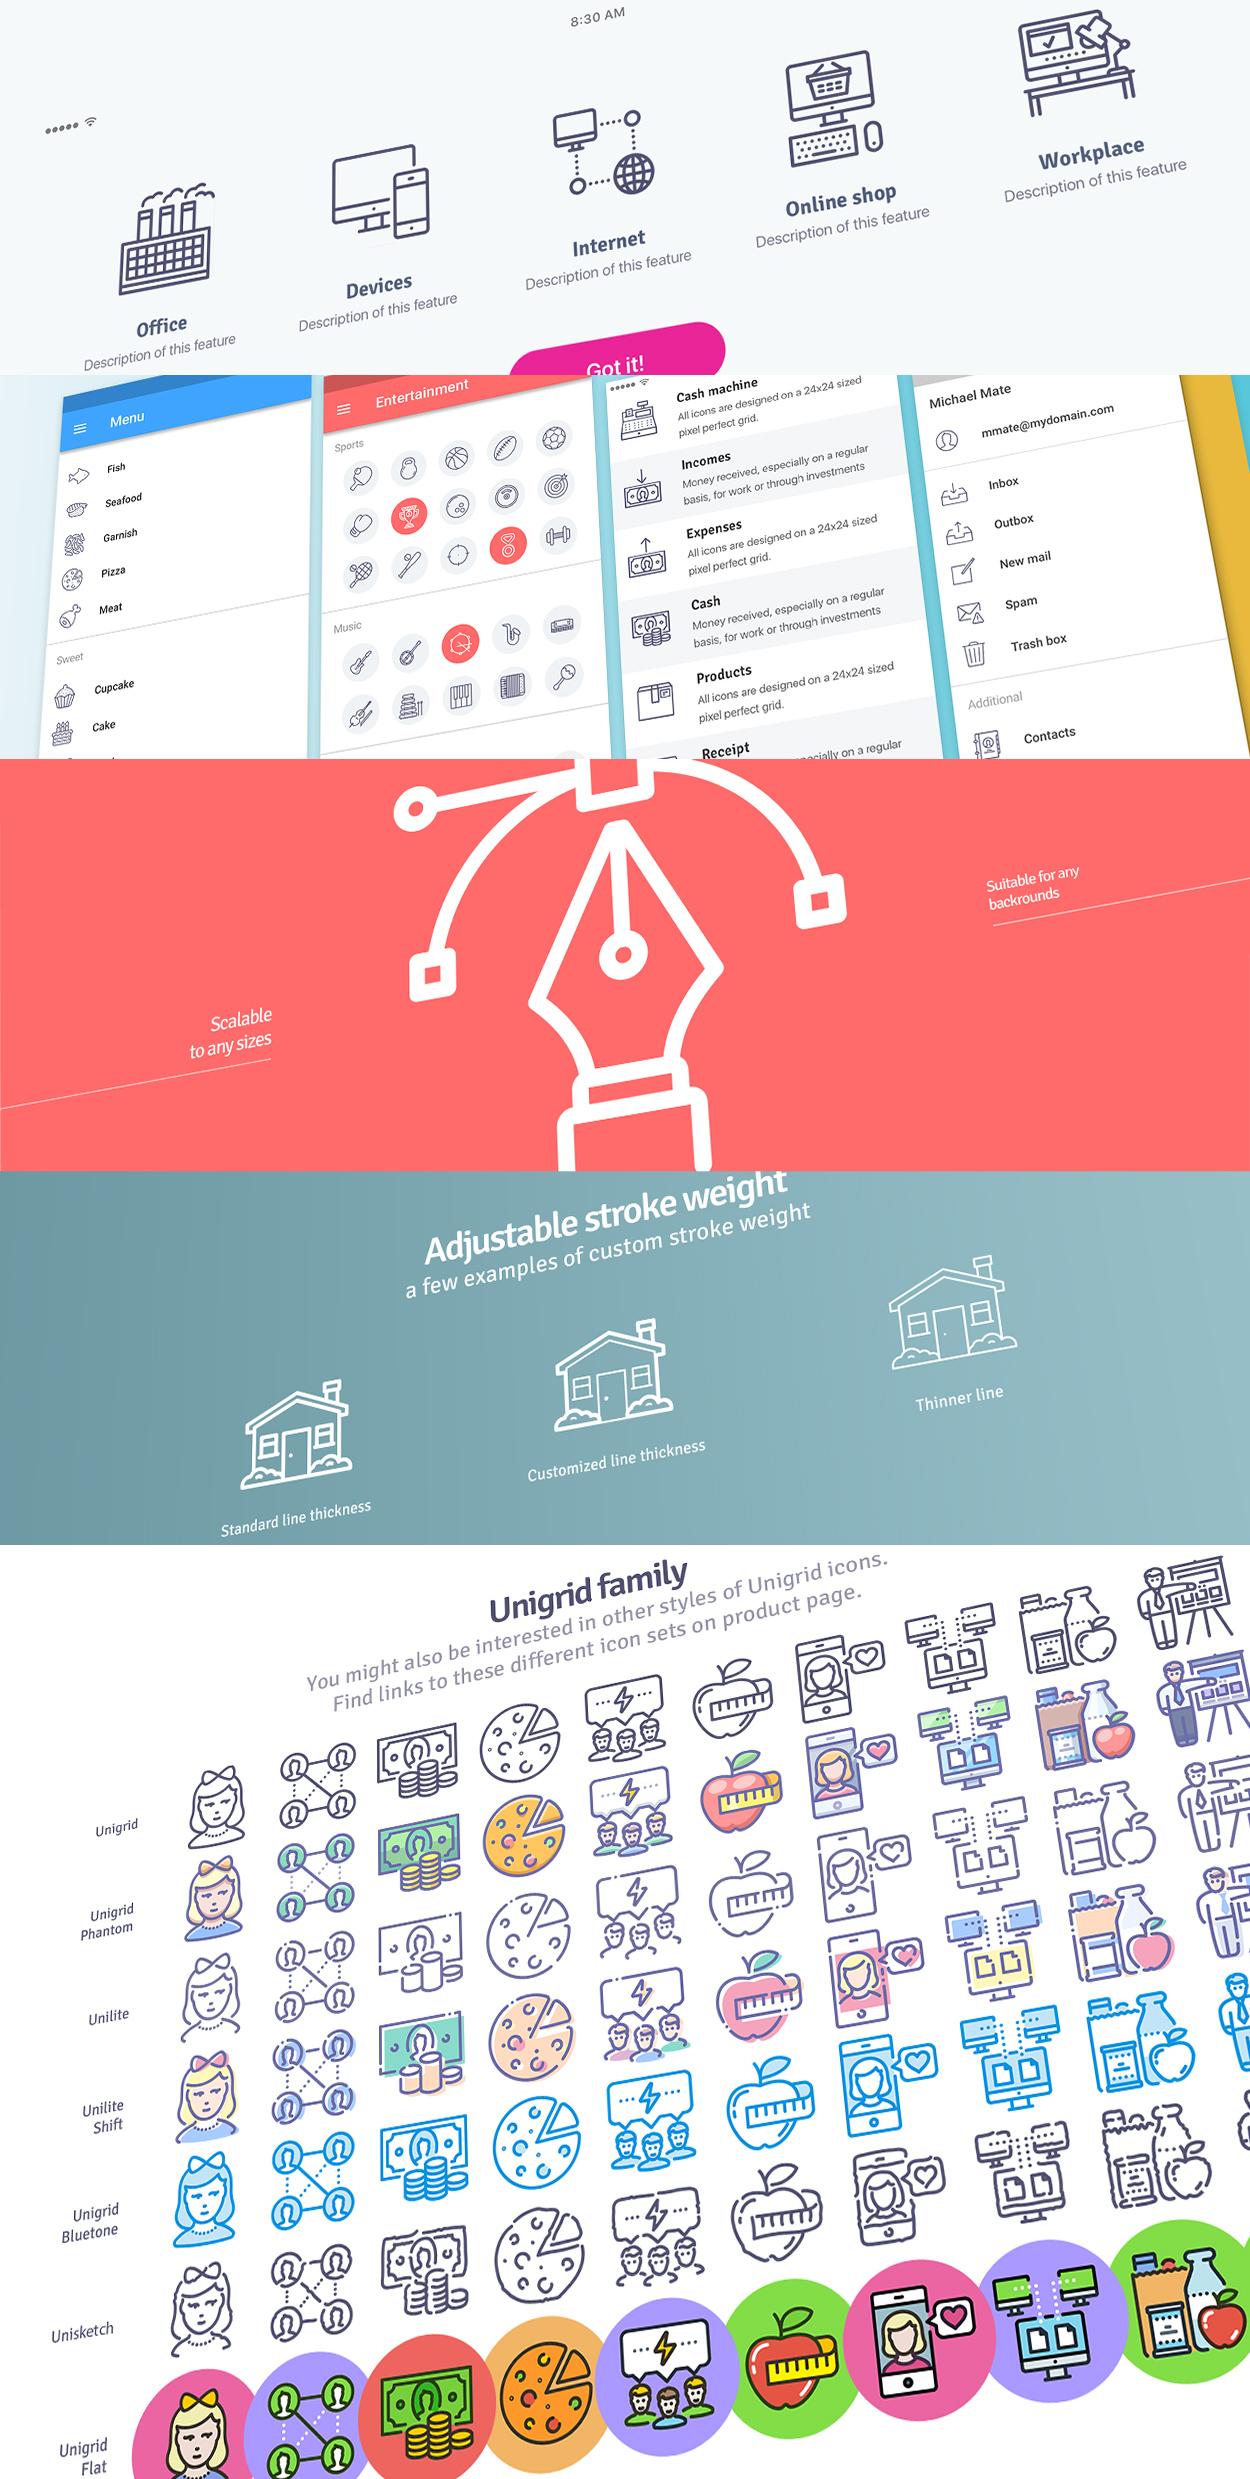 Unigrid icons usage example